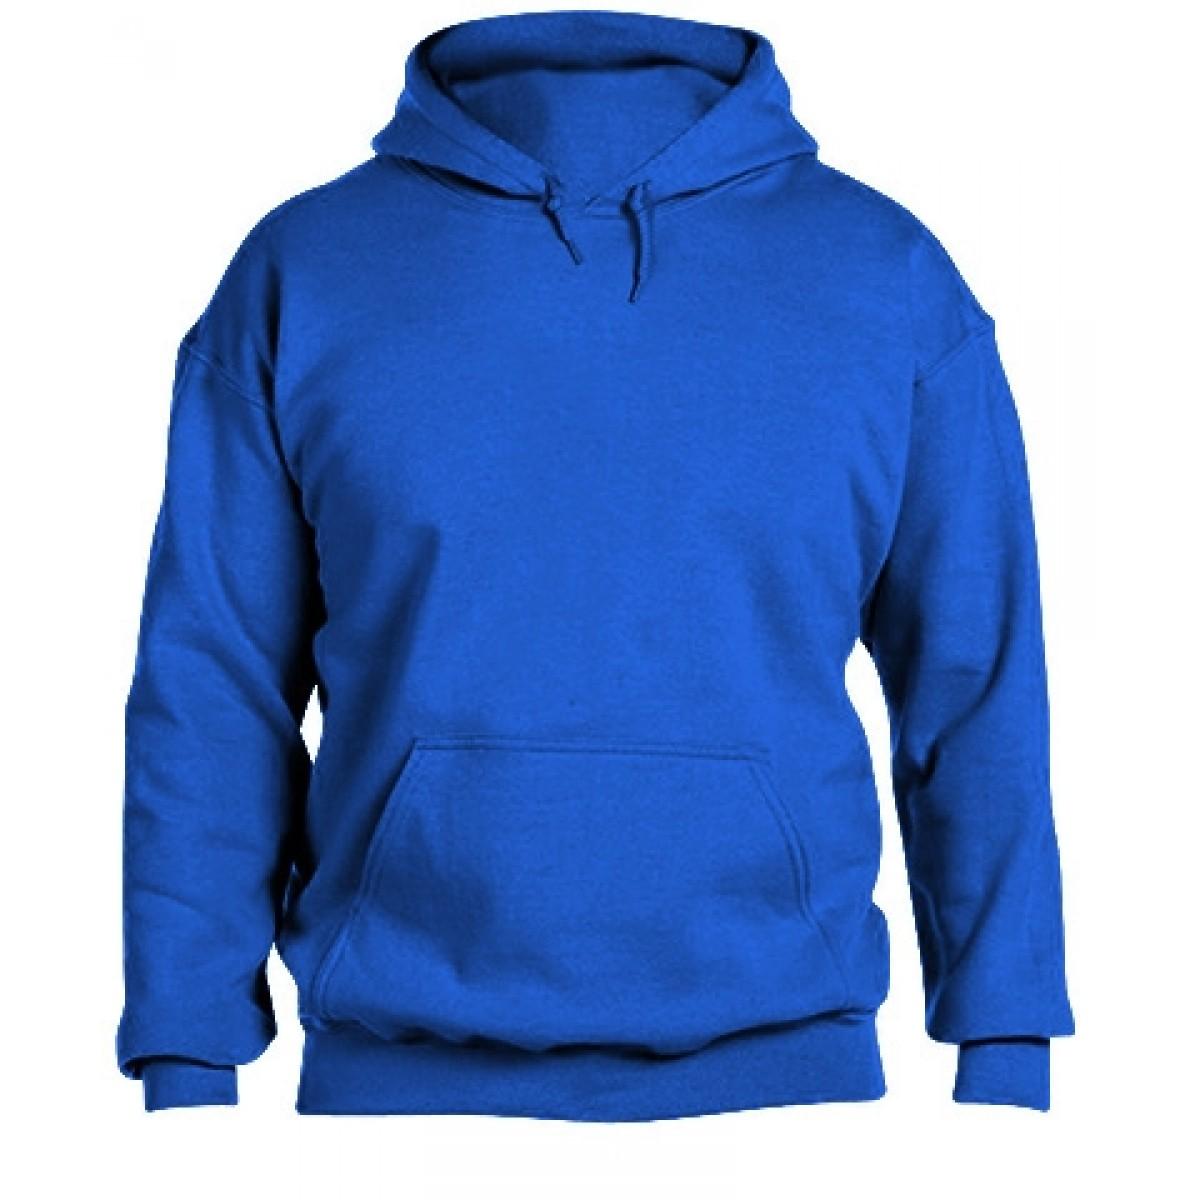 Solid Hooded Sweatshirt  50/50 Heavy Blend-Royal Blue-XL